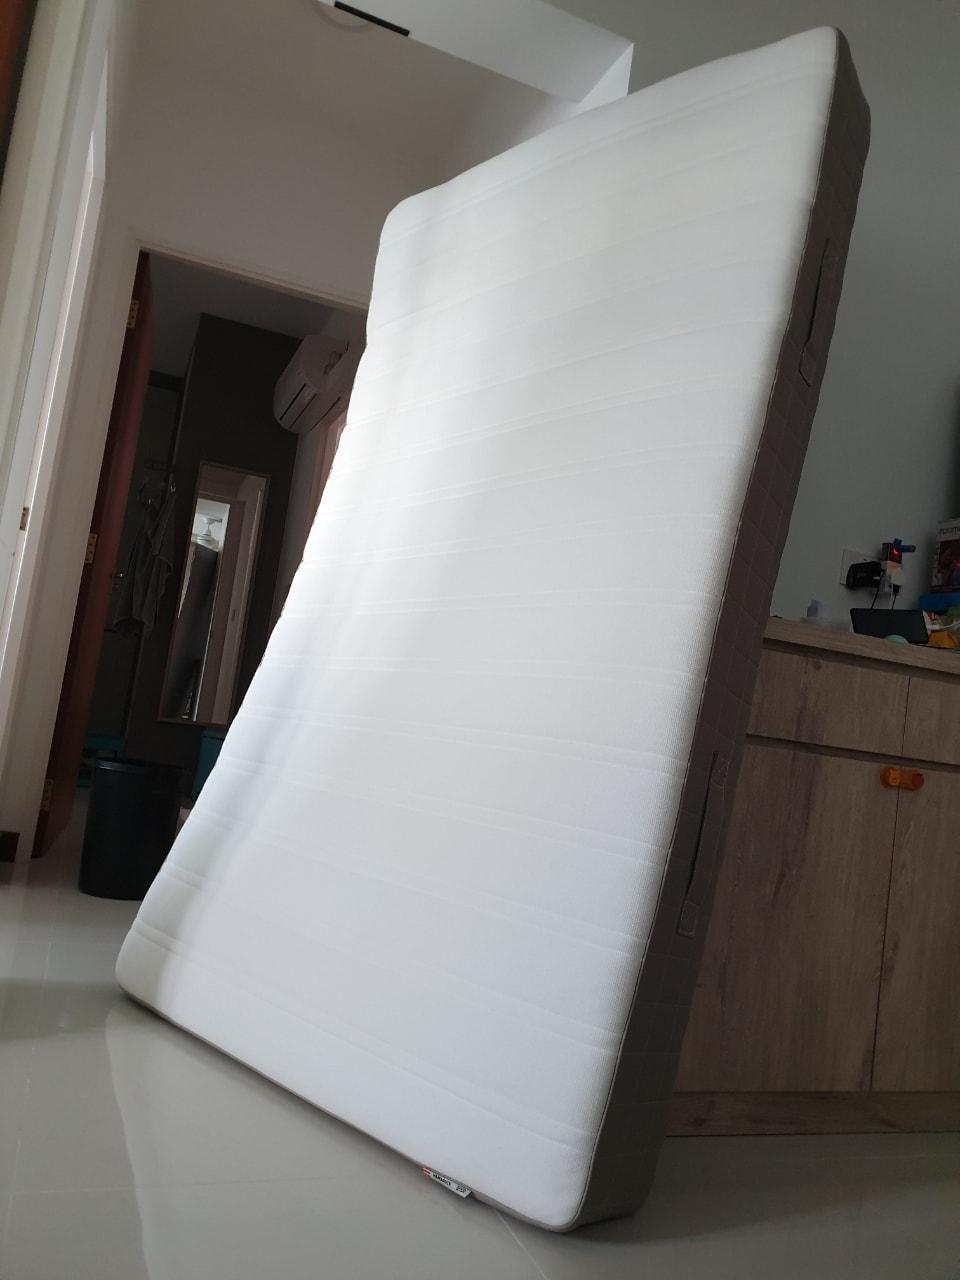 4 Year old IKEA HAMARVIK super single mattress